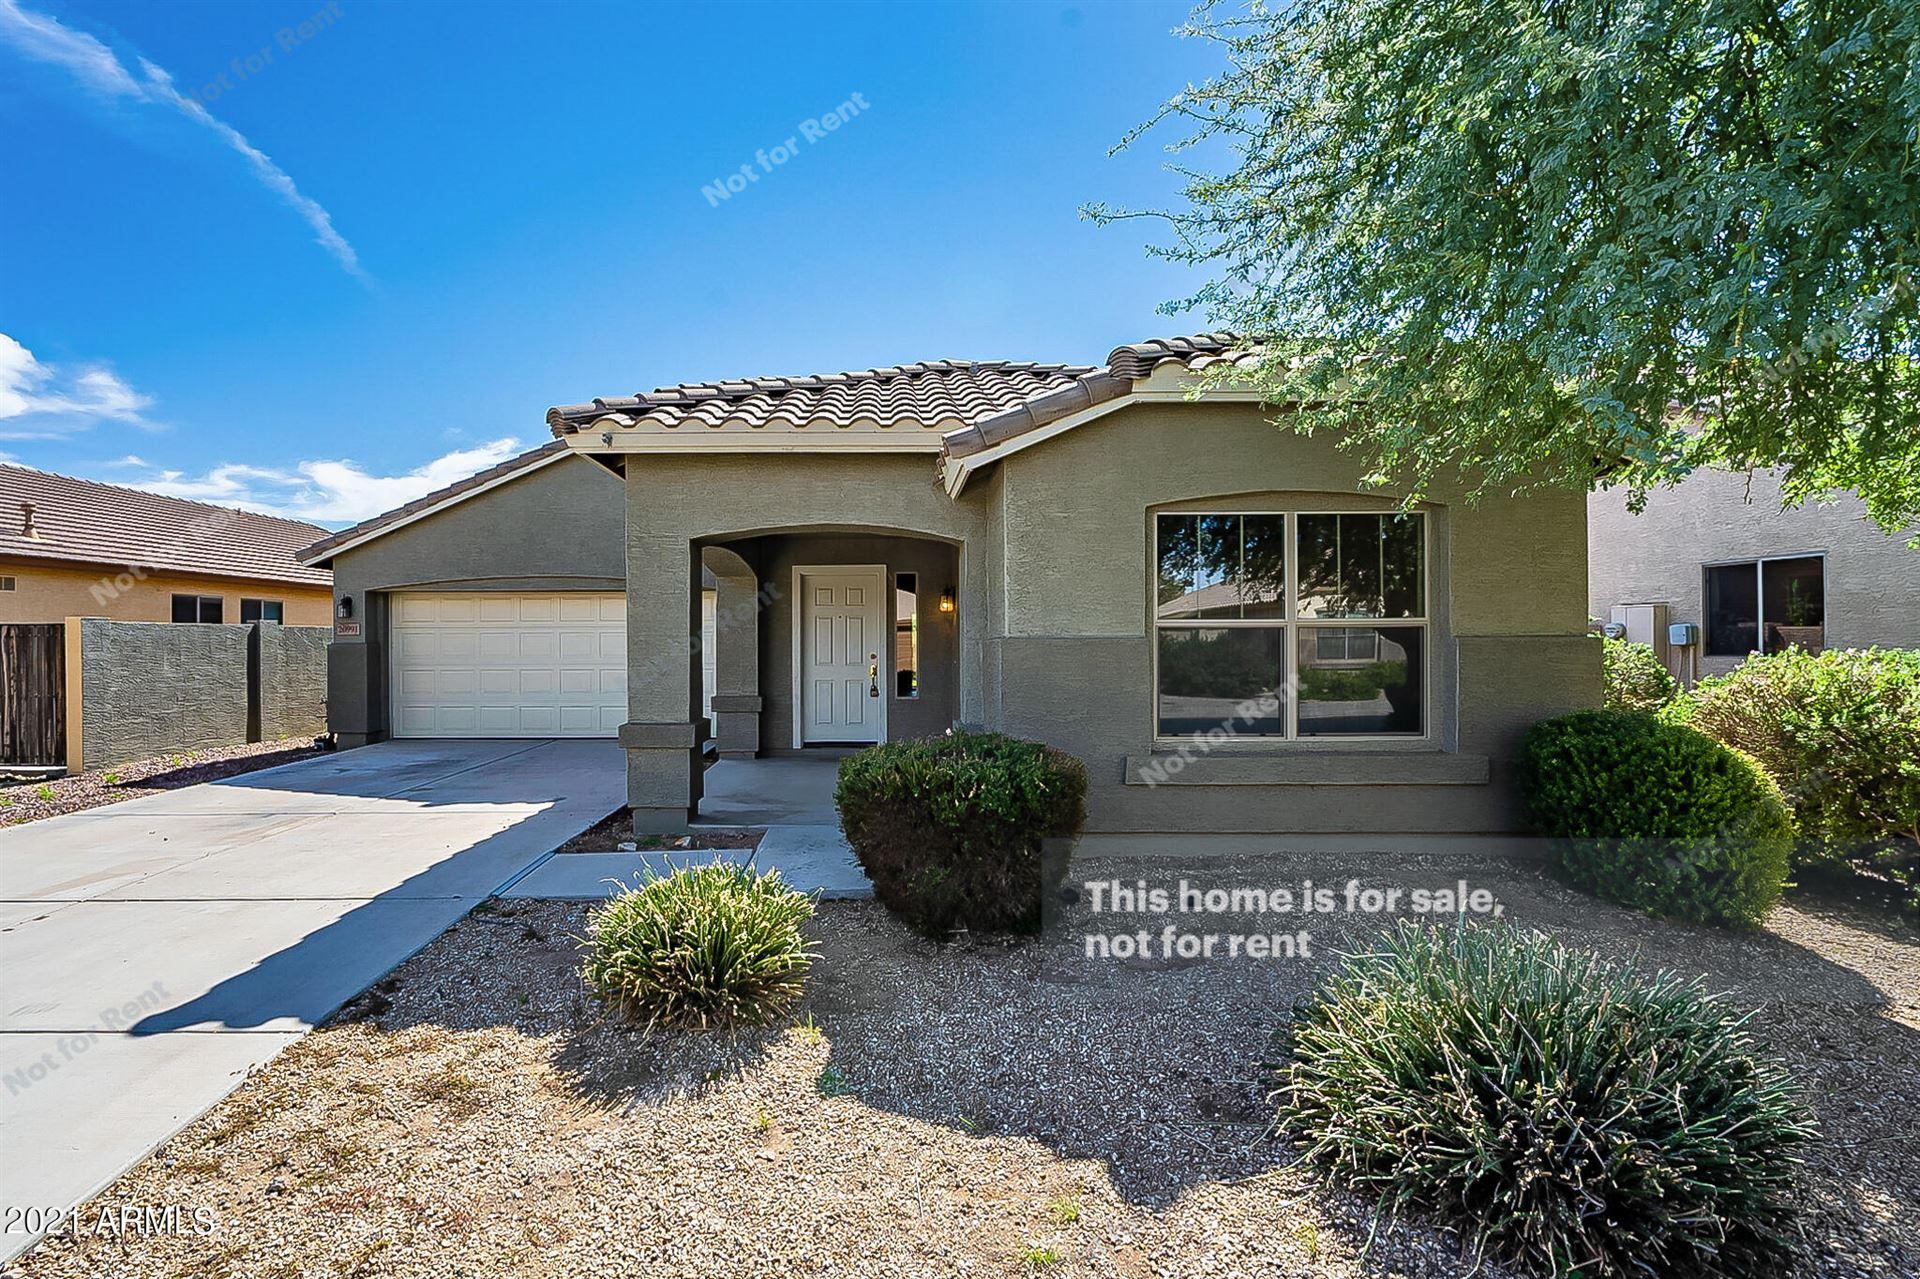 20991 N LEONA Boulevard, Maricopa, AZ 85138 - #: 6308250